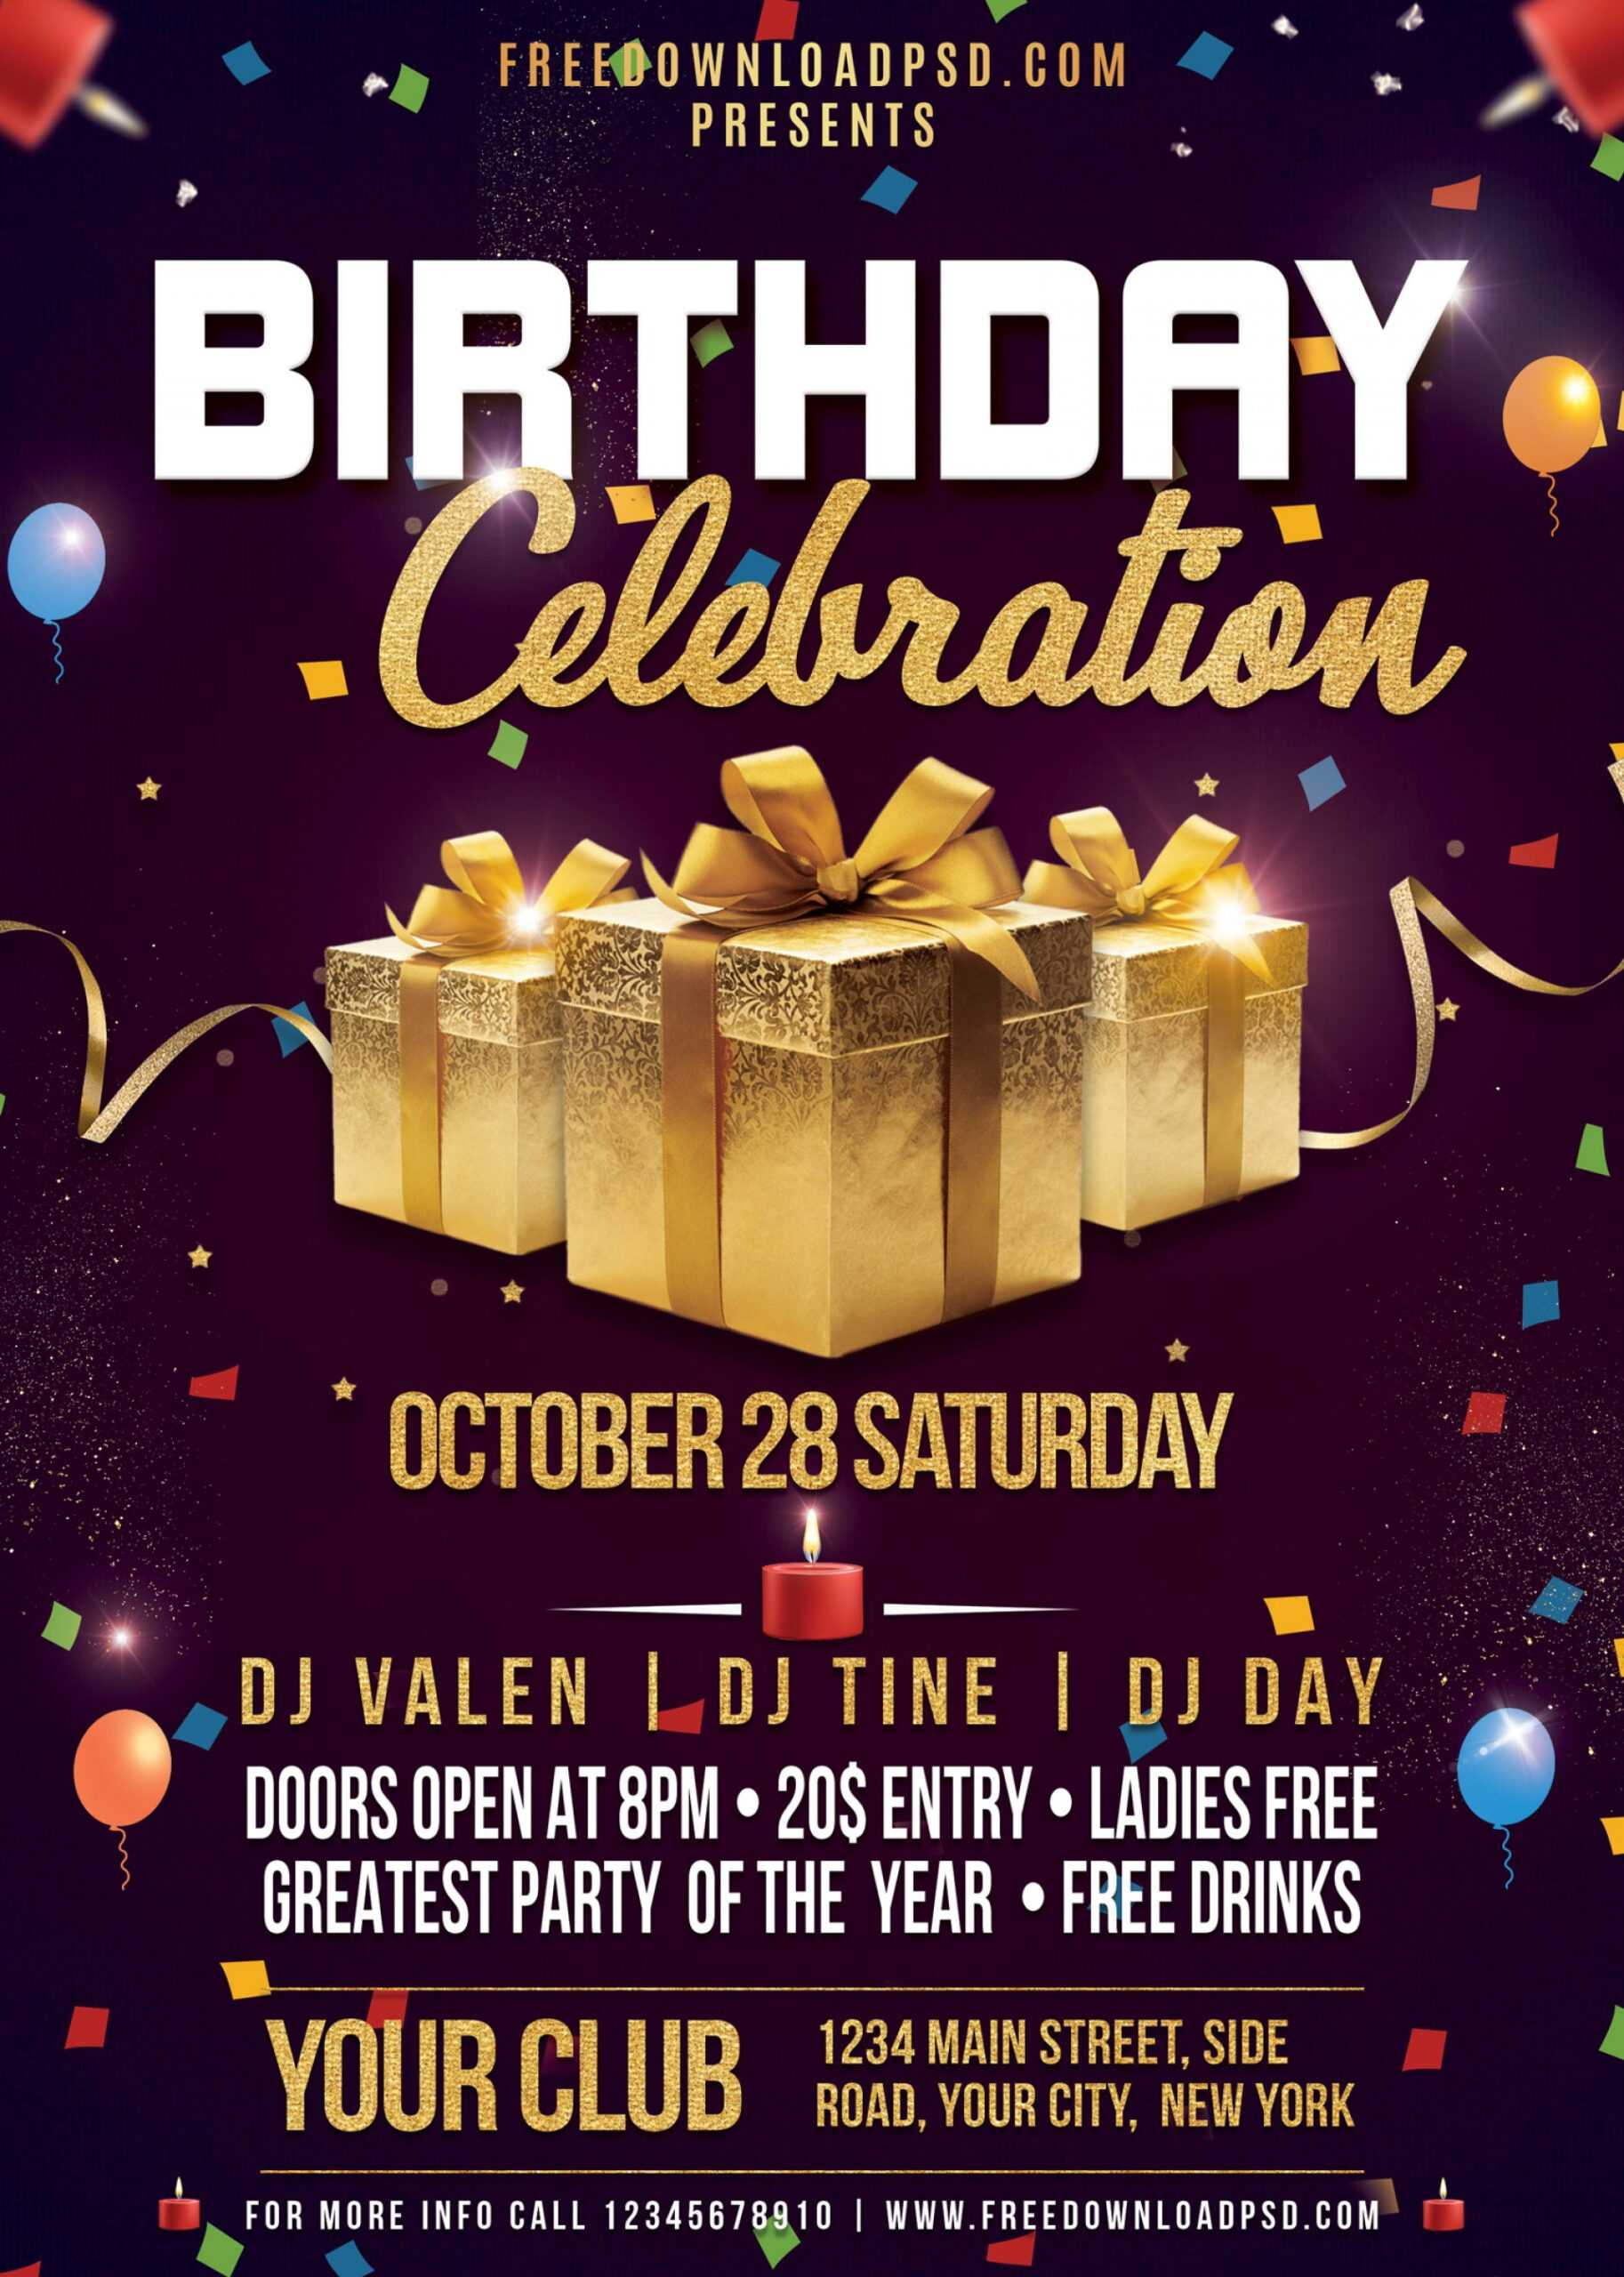 021 Free Birthday Flyer Templates Psd Template Awesome Ideas Throughout Free Birthday Flyer Templates